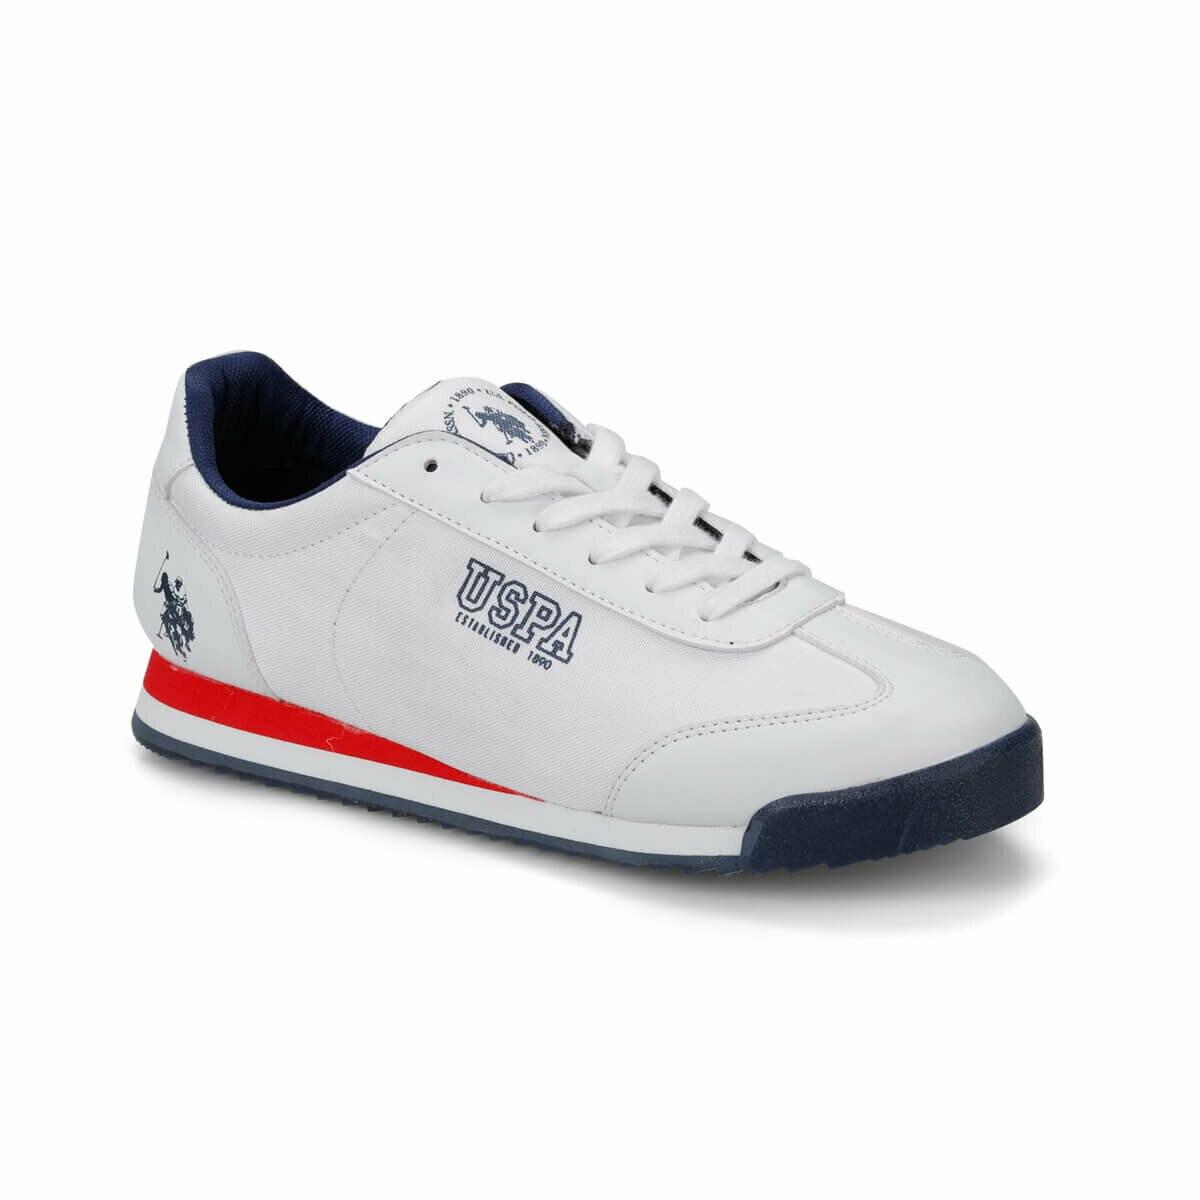 FLO Men Sneaker Sport Casual Fashion White Men's Sport Sneaker Shoes Мужские кроссовки DEEP SUMMER U.S. POLO ASSN.